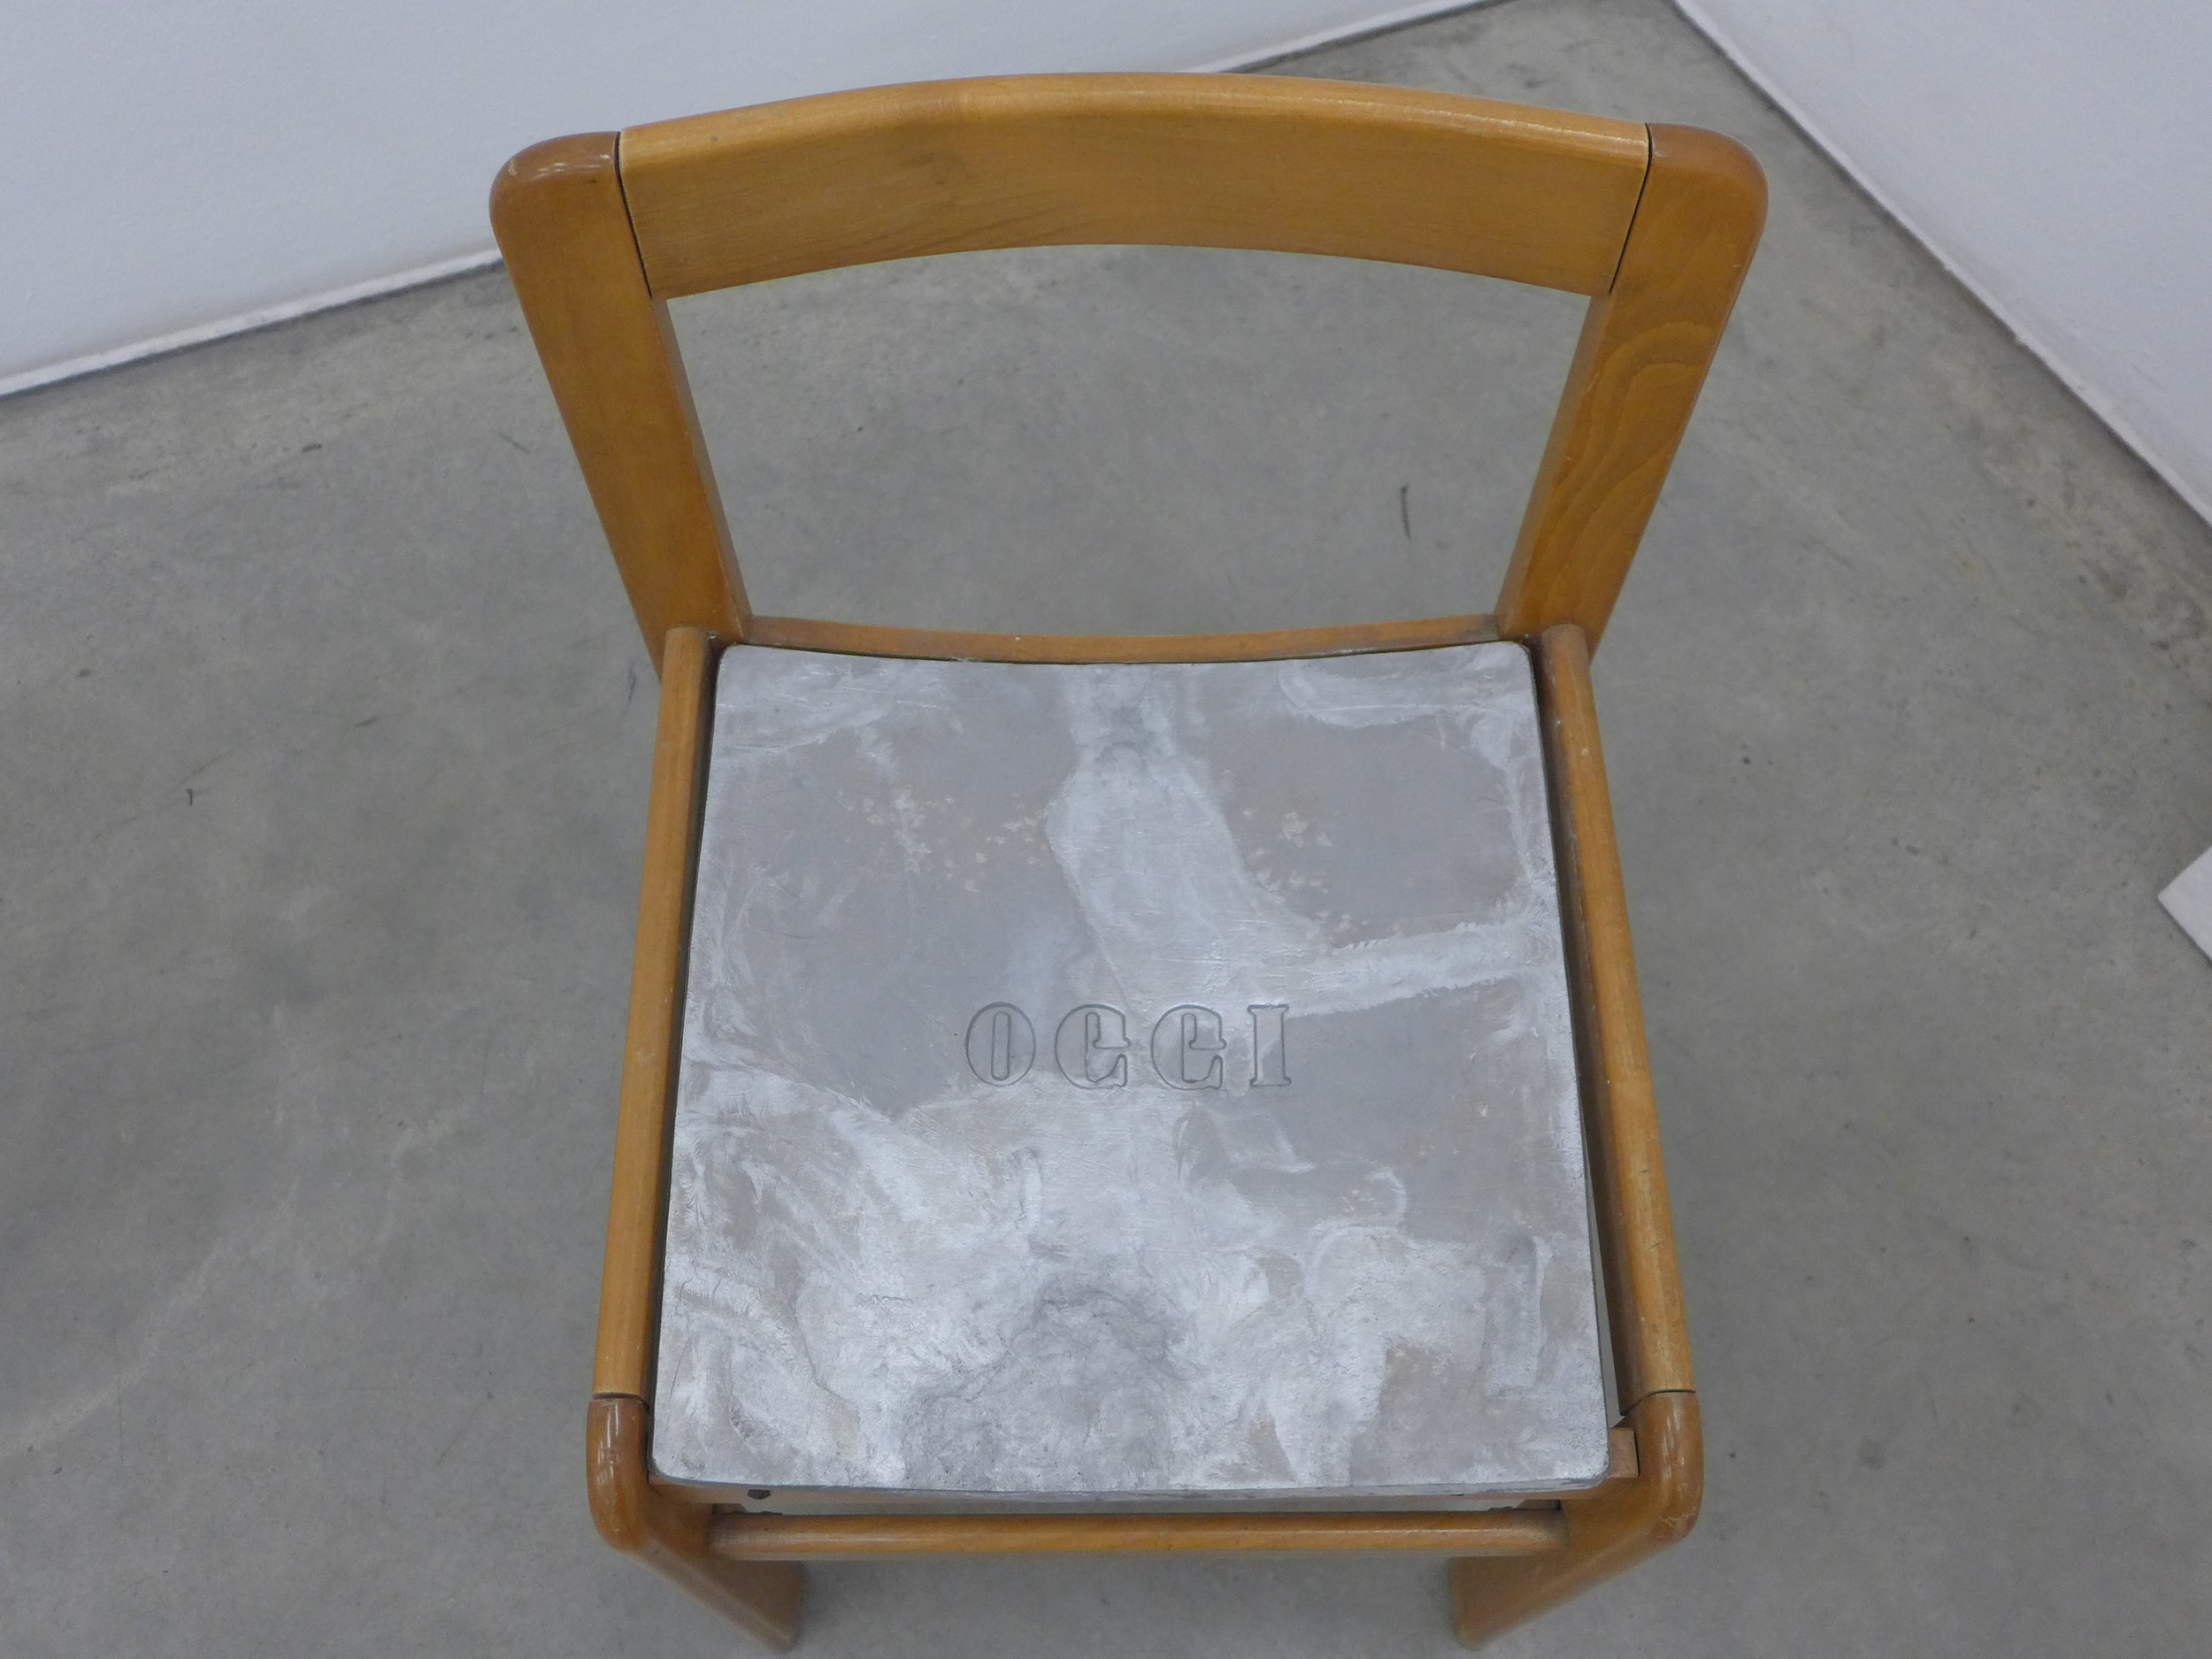 HH LIM, Detail Lao Tzu said, 2016, Mixed Media, 250 x 250 cm / 80 x 47 cm / ø 42 cm, Courtesy: The Artist and Christine König Galerie